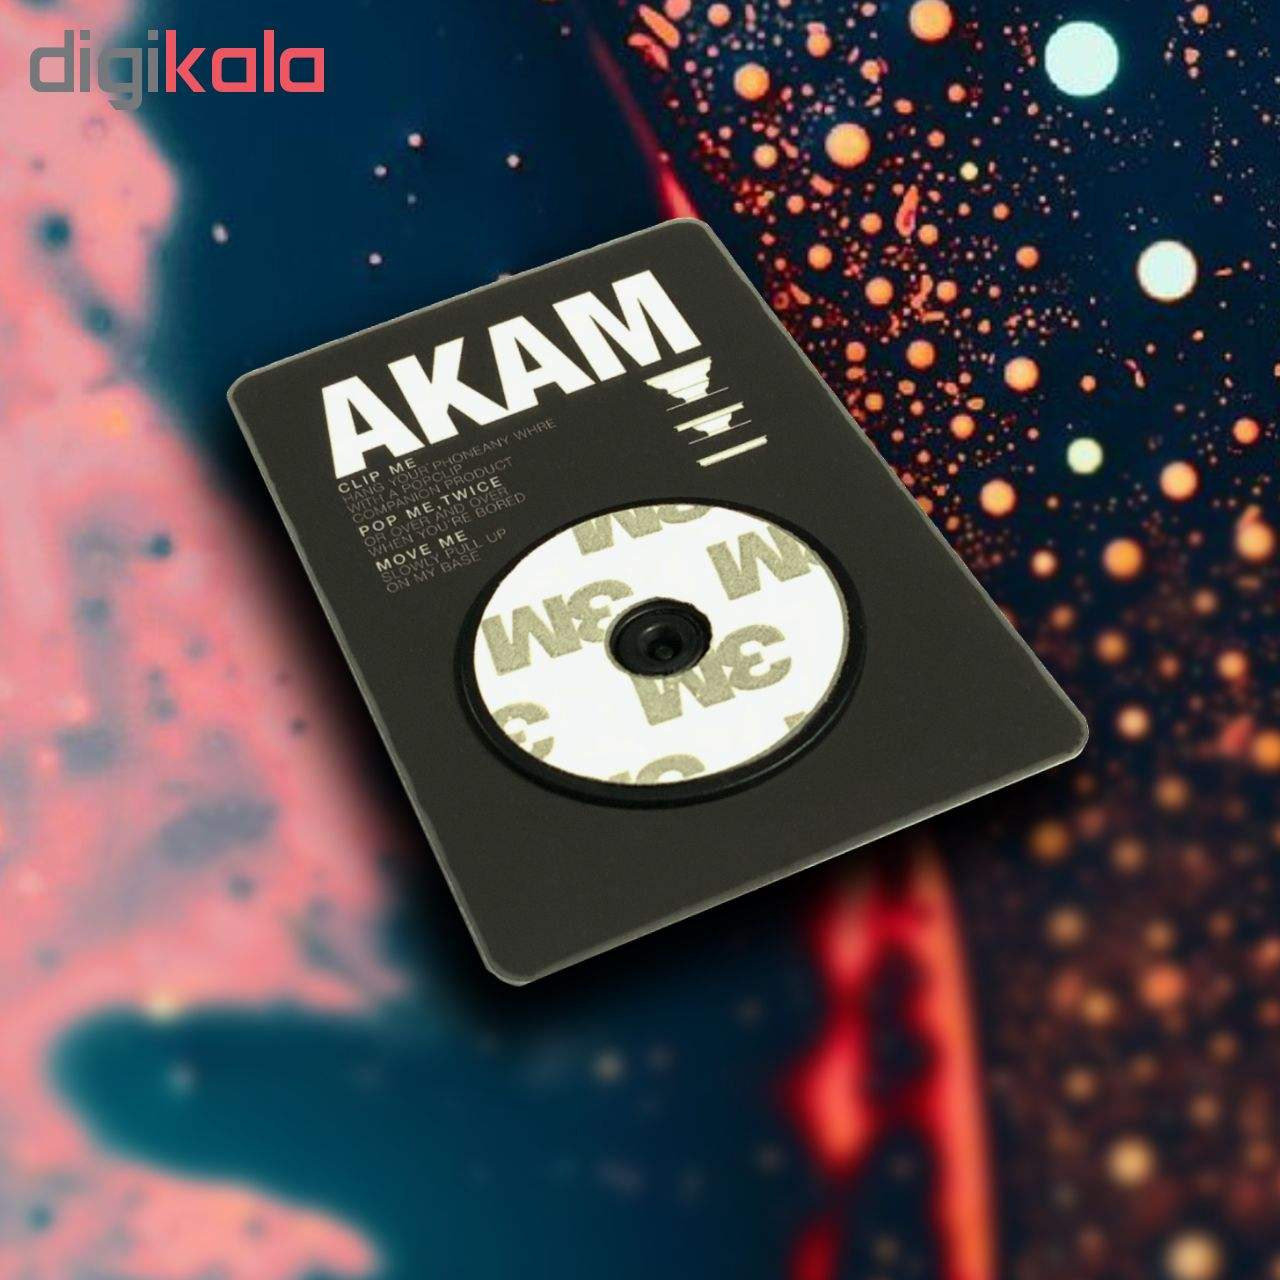 پایه نگهدارنده گوشی موبایل پاپ سوکت آکام مدل APS0211 main 1 2